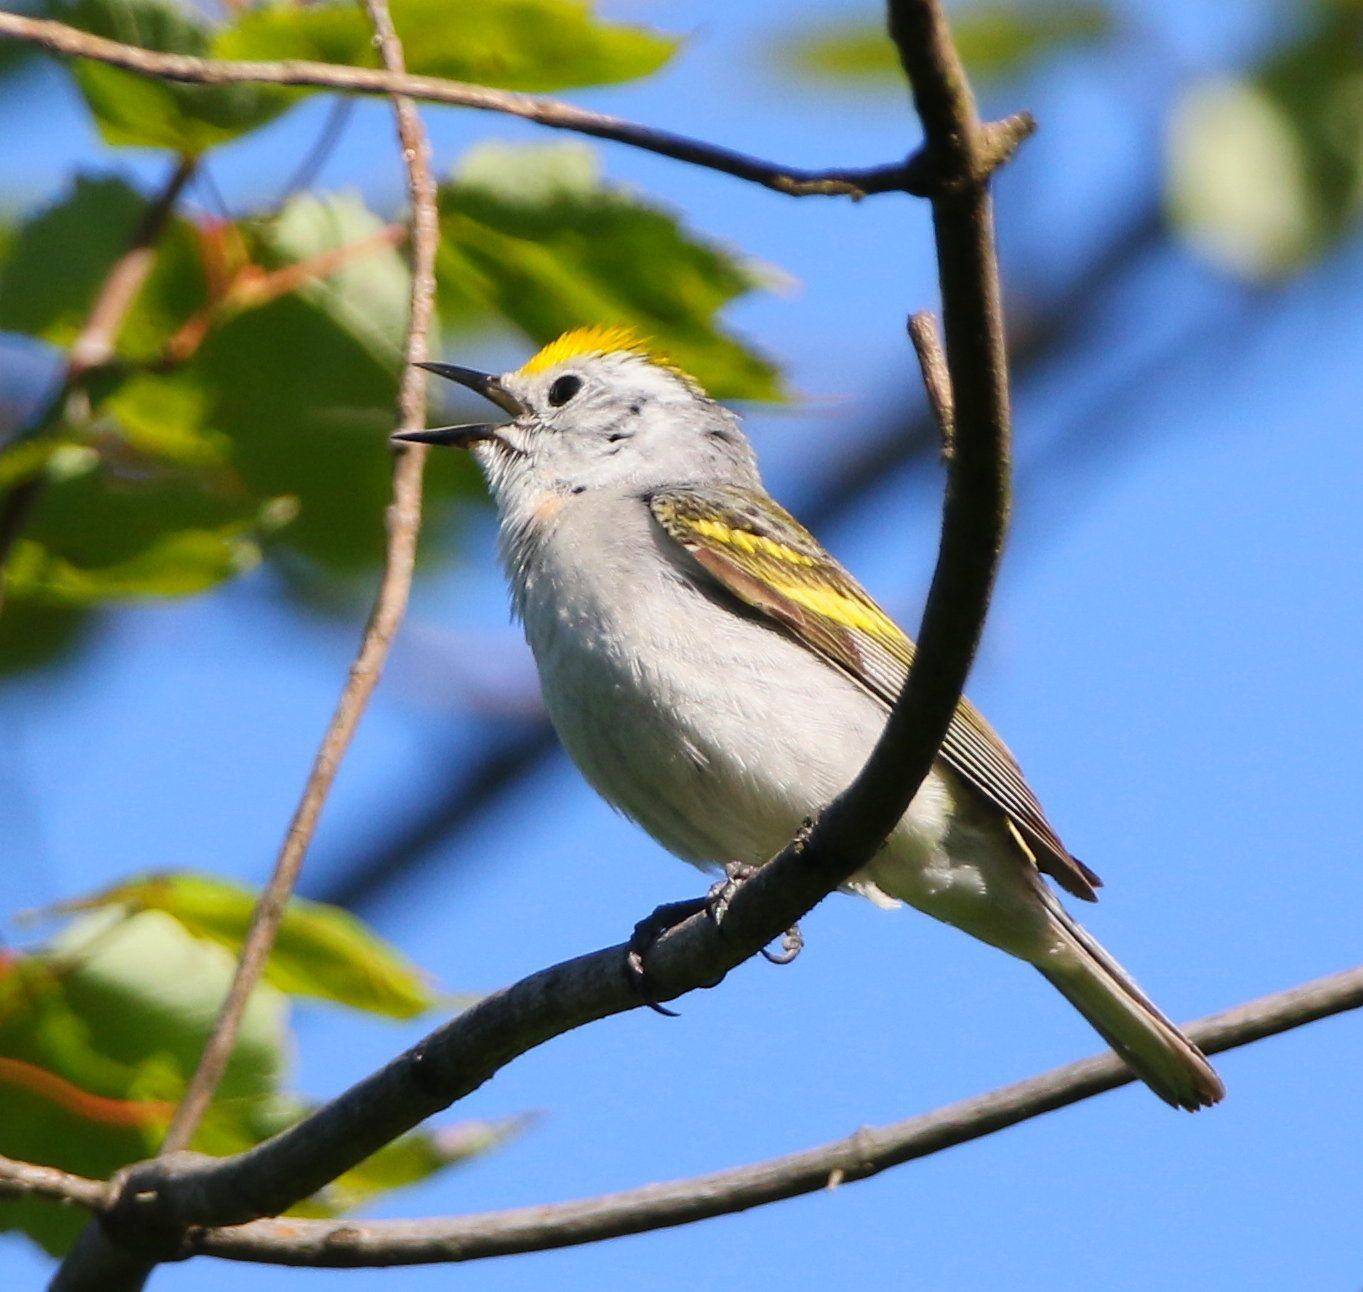 The rare hybrid singing